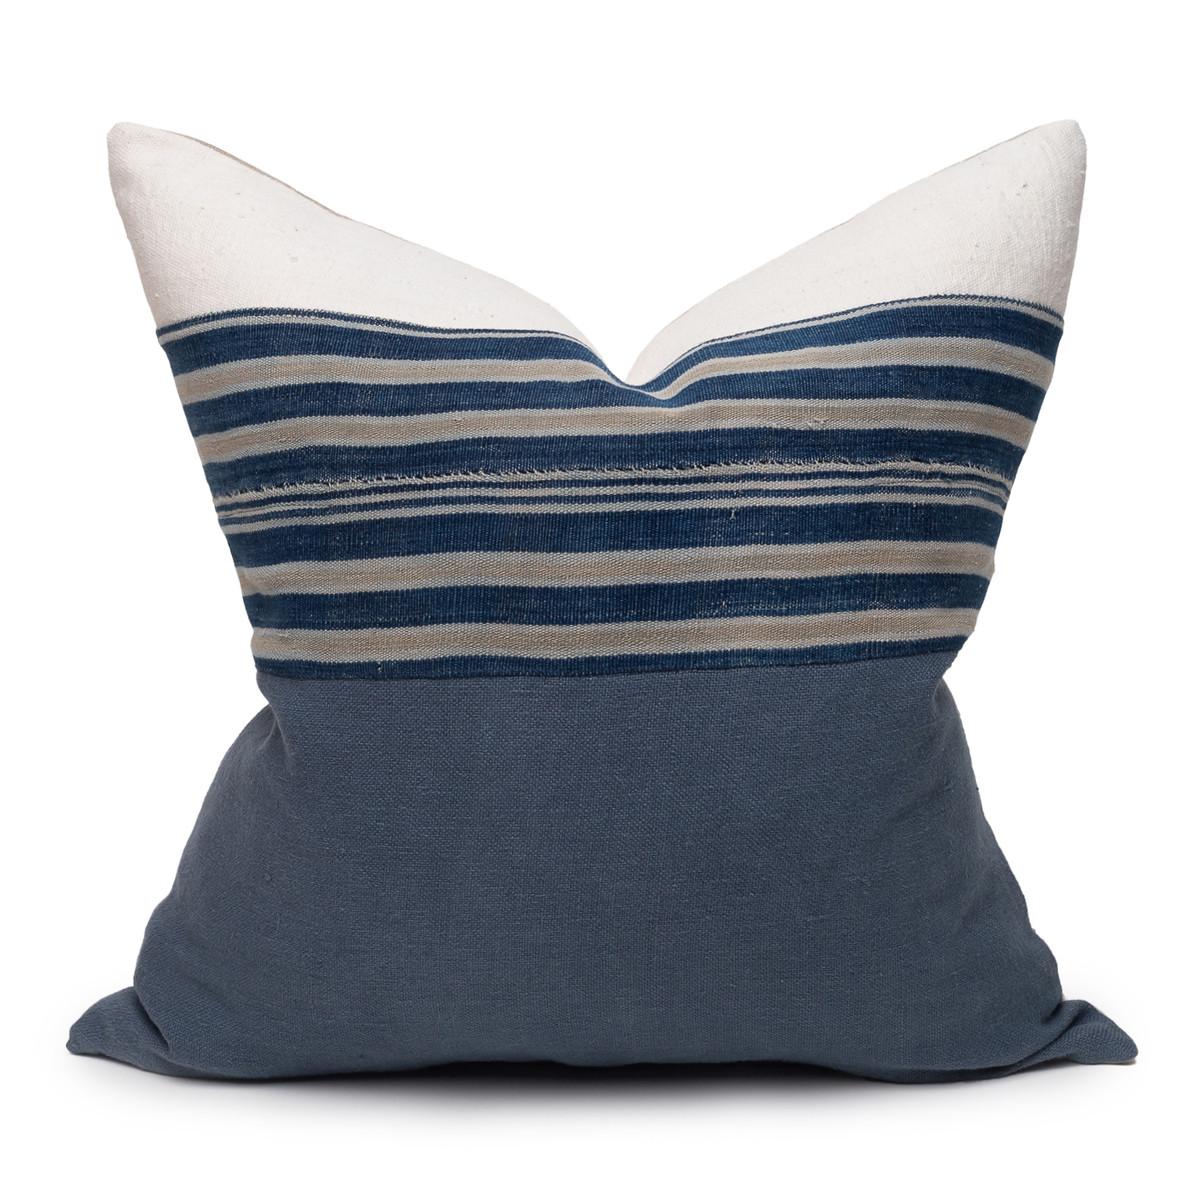 Marin Blue Indigo Mud Cloth Pillow - 22 - Front View